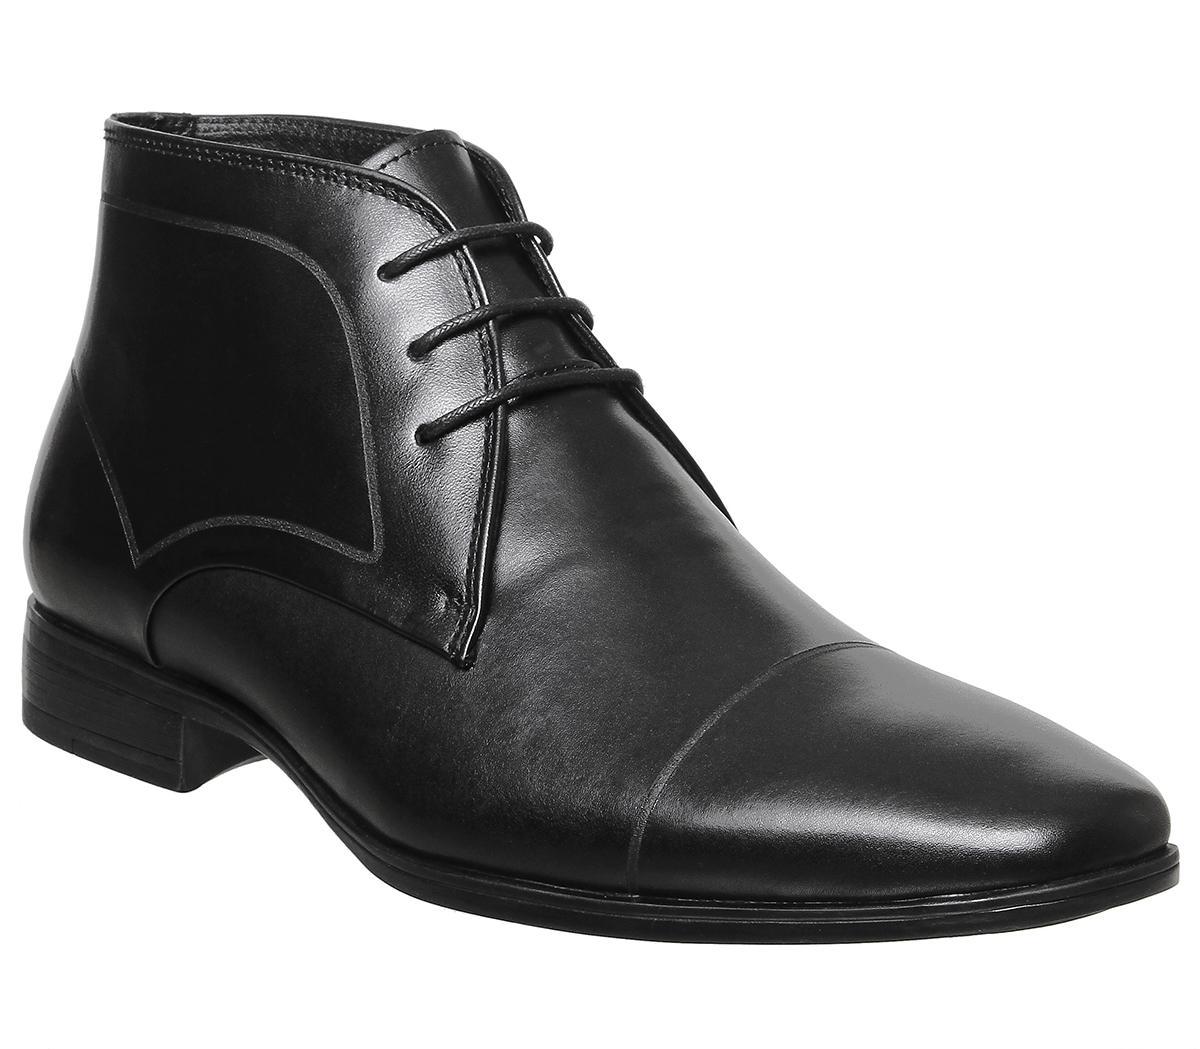 Bowman Chukka Boots